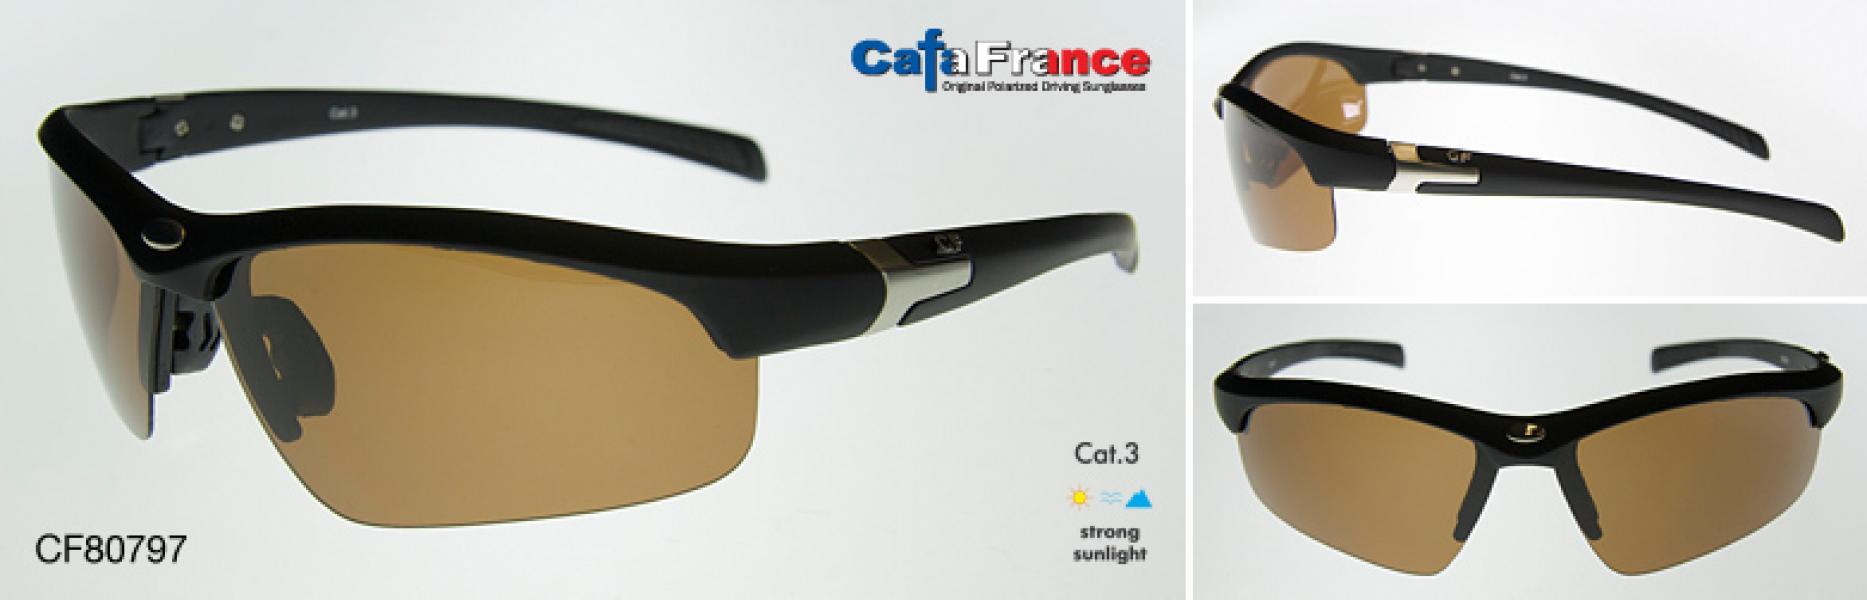 ���� ��������������� ������� Cafa France cf80797